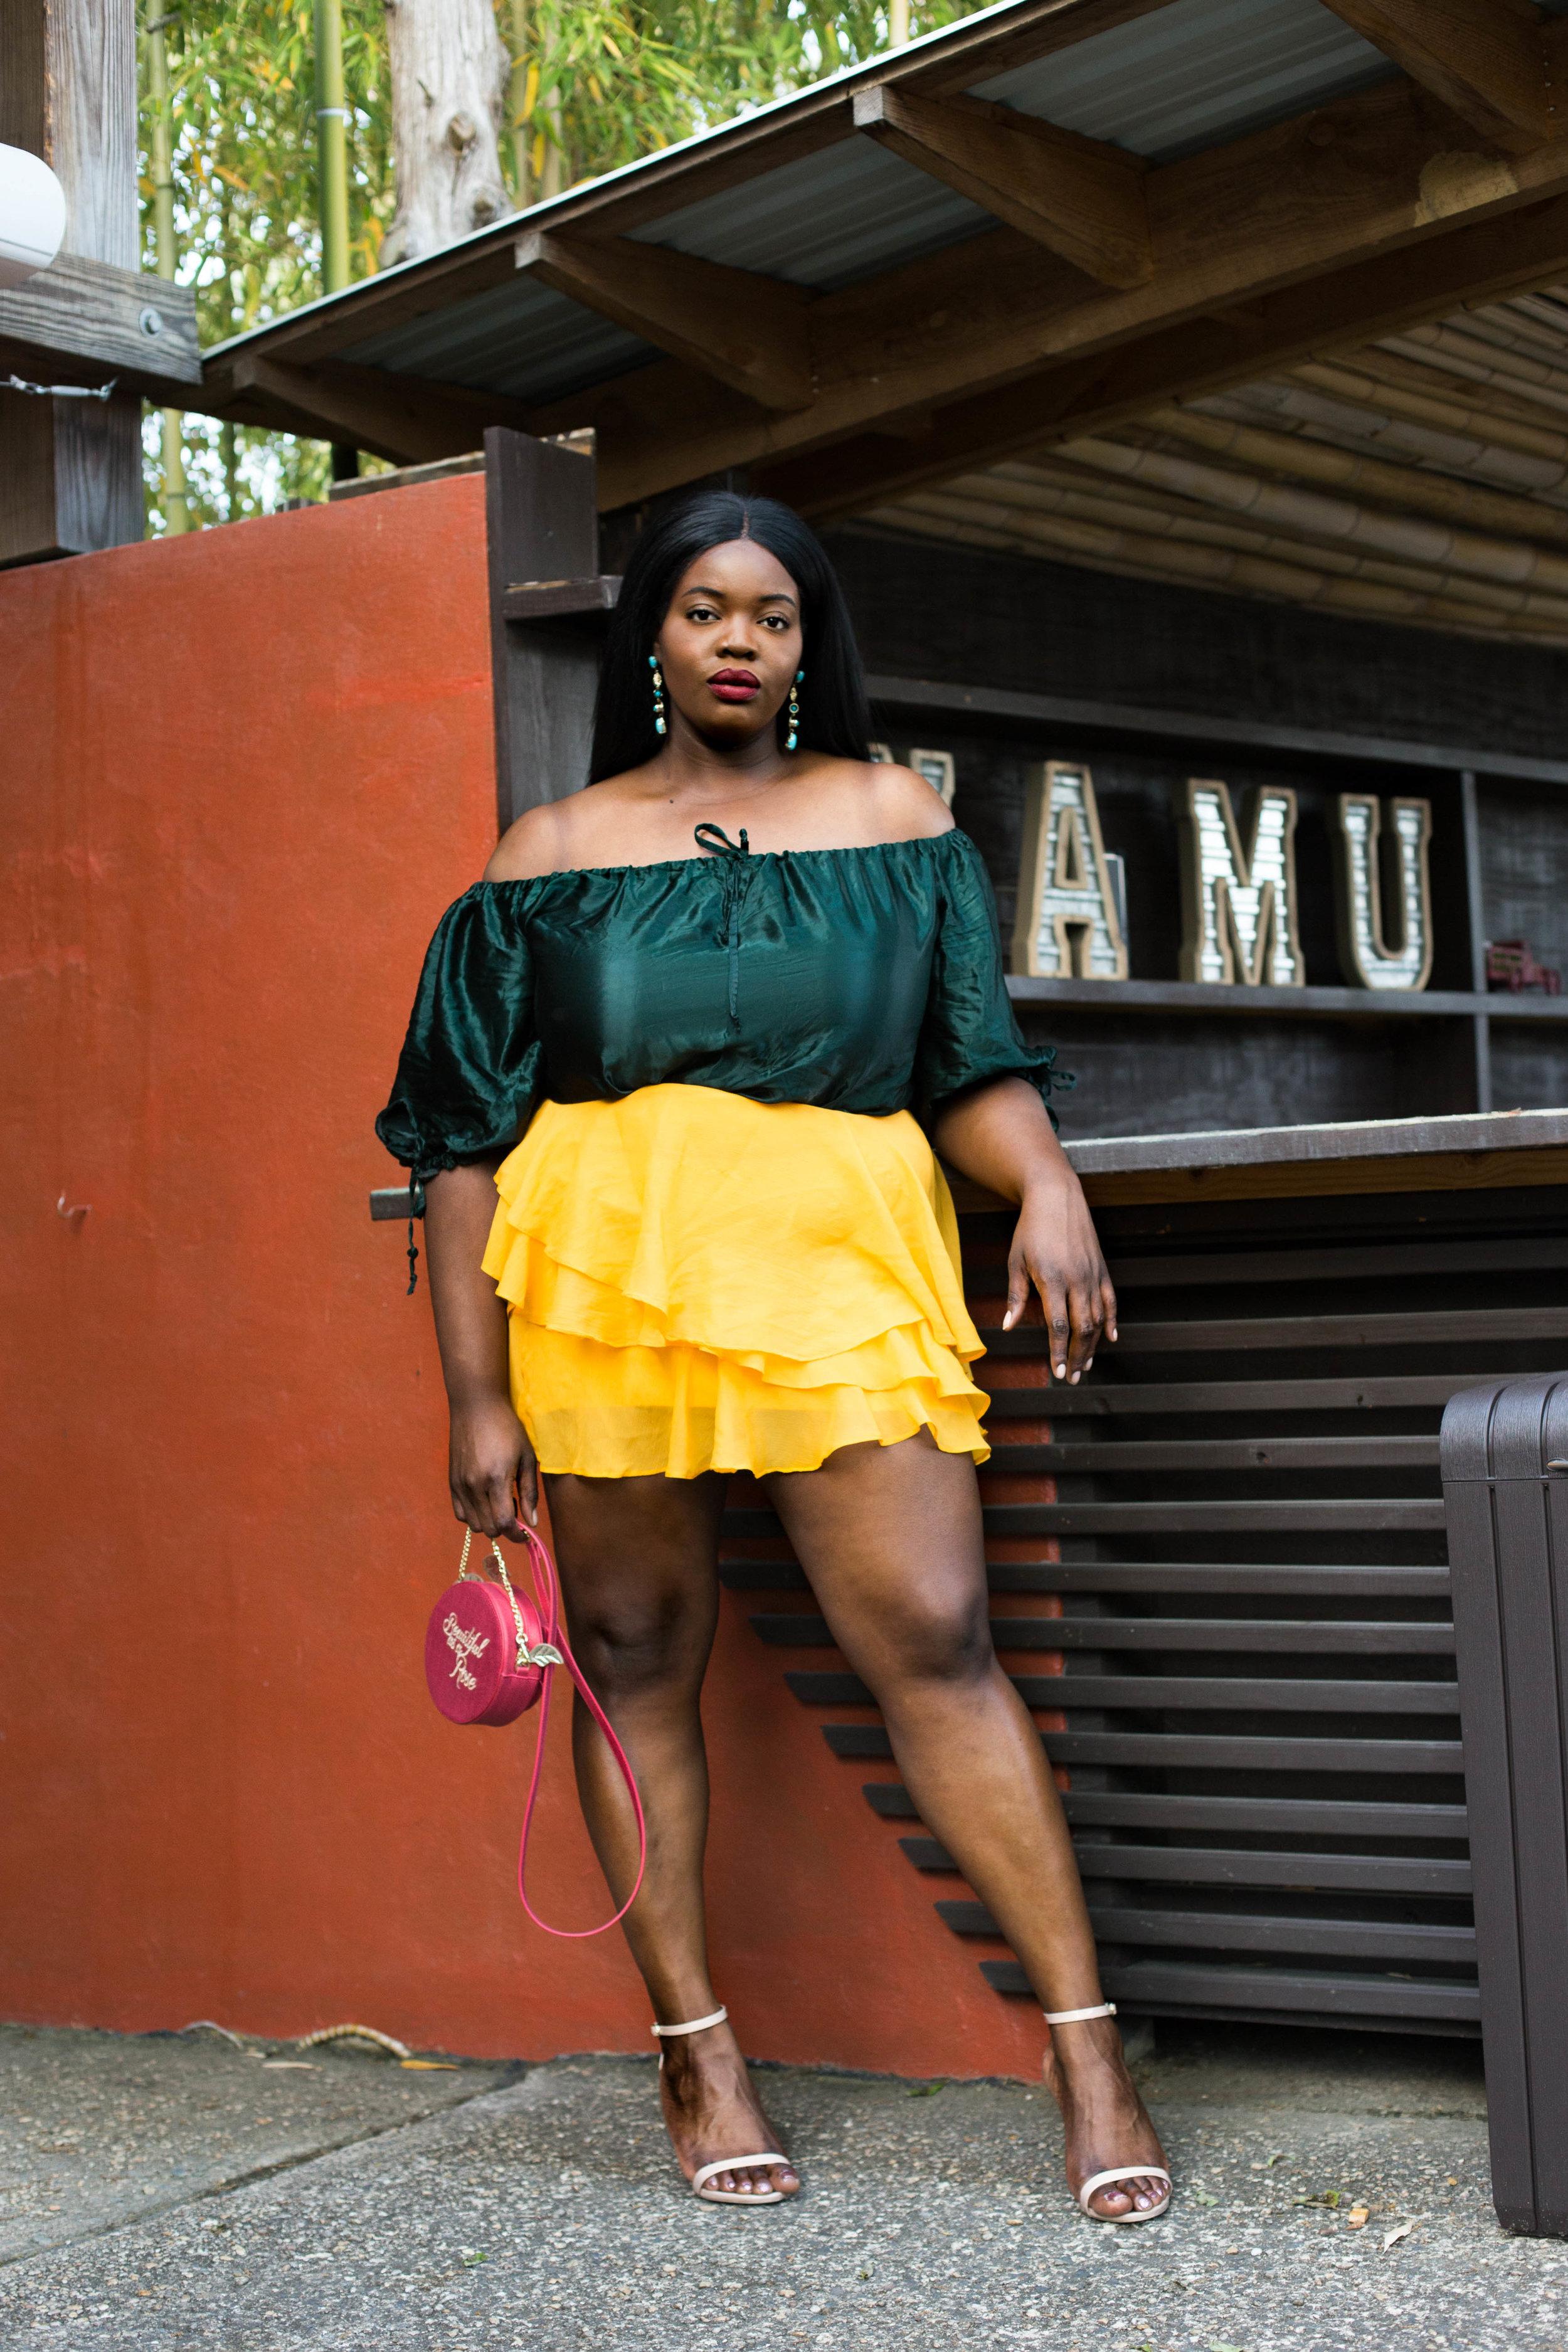 valerie-eguavoen-on-a-curve-yellow-skirt-asos-off-shoulder-blouse-8105 2.jpg